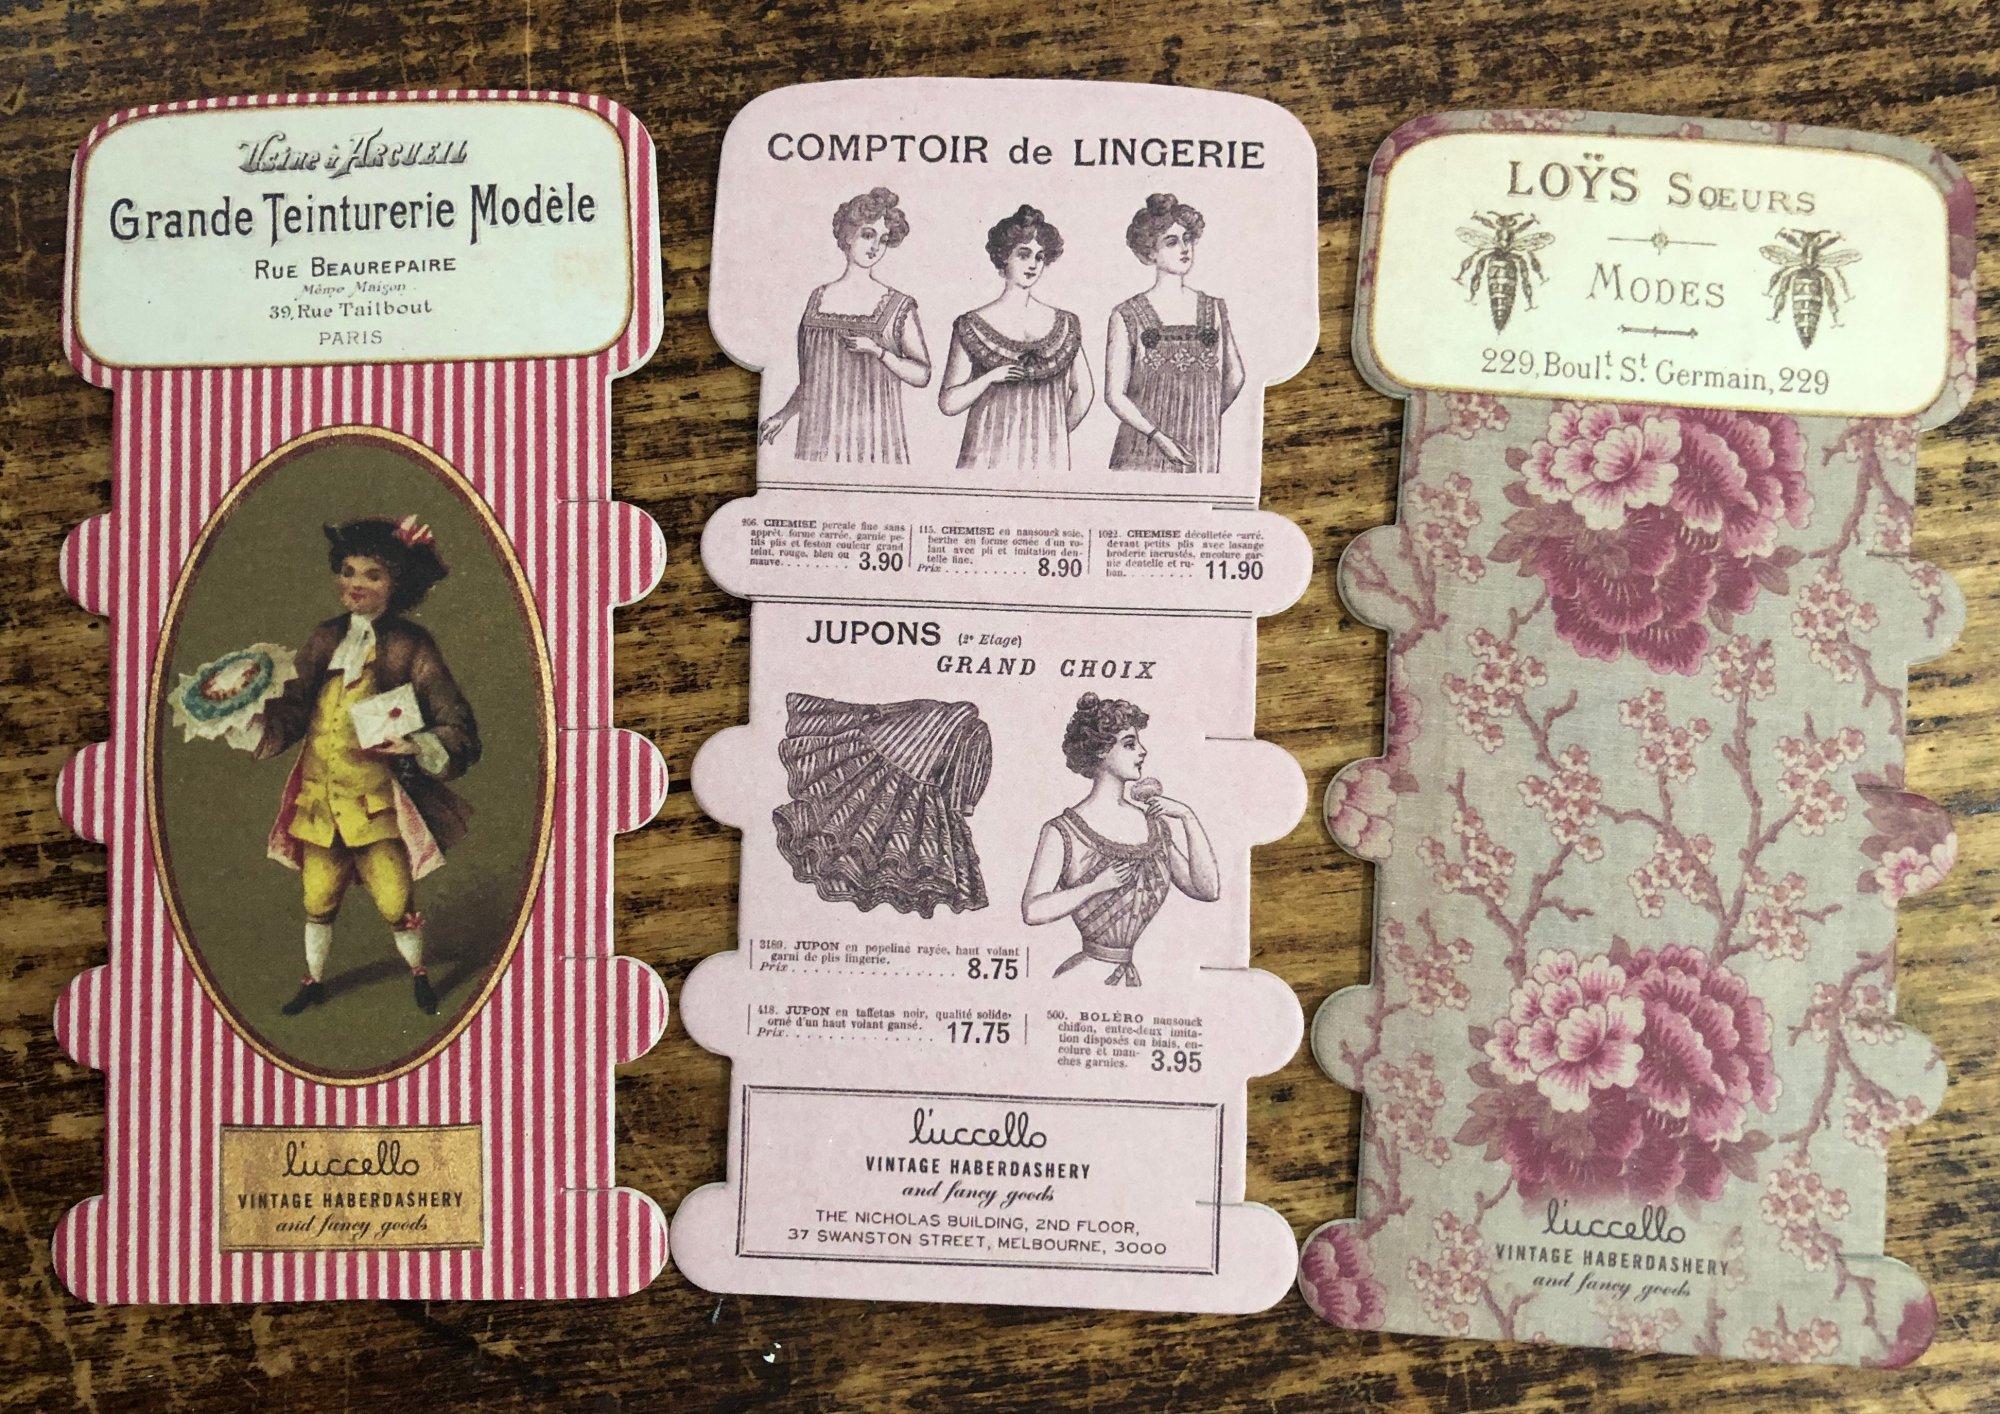 Luchello Thread and Ribbon Storage Cards